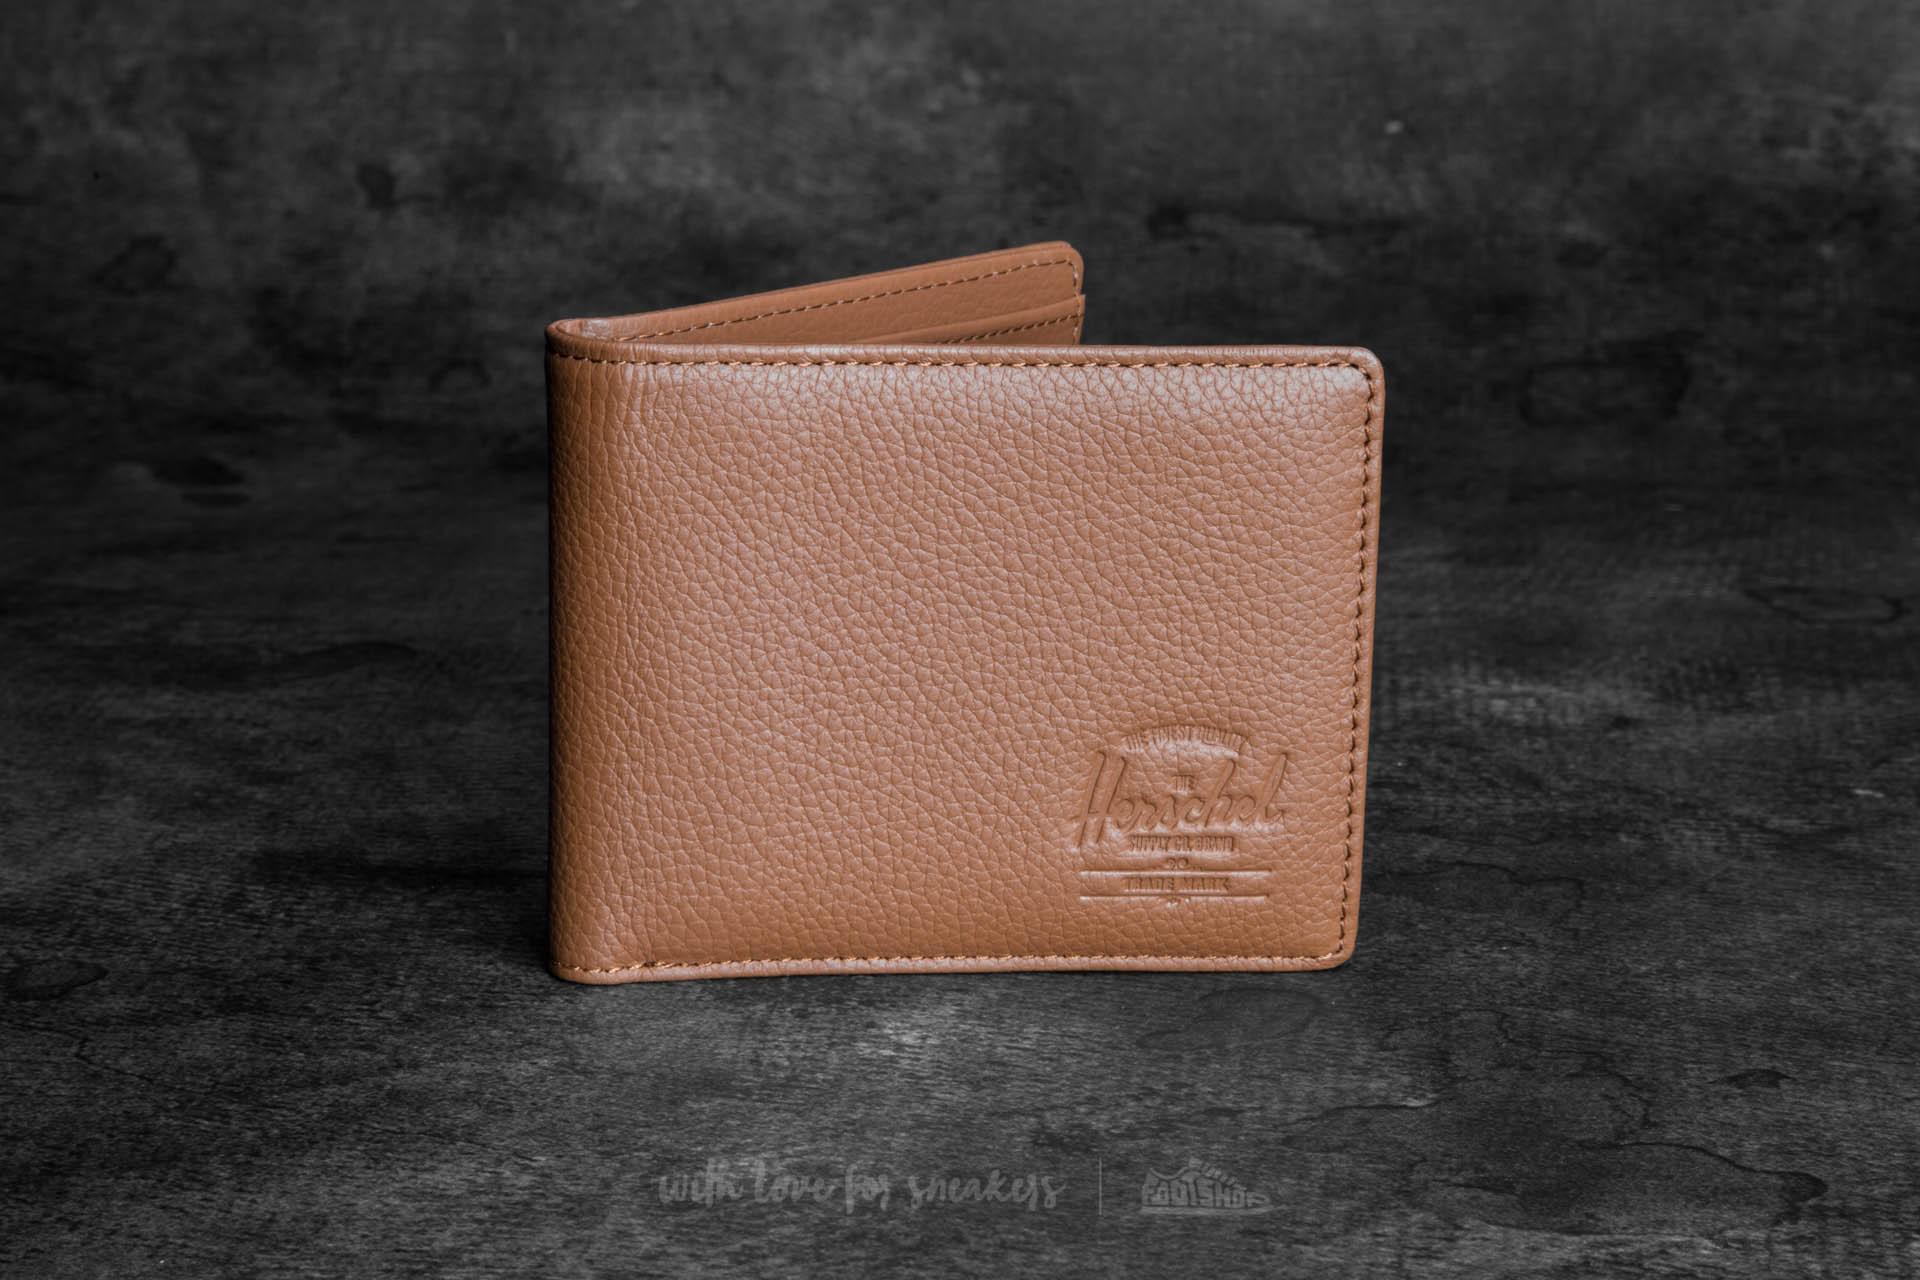 eb194cb57d9b Lyst - Herschel Supply Co. Hank Leather Wallet Tan Pebbled Leather ...